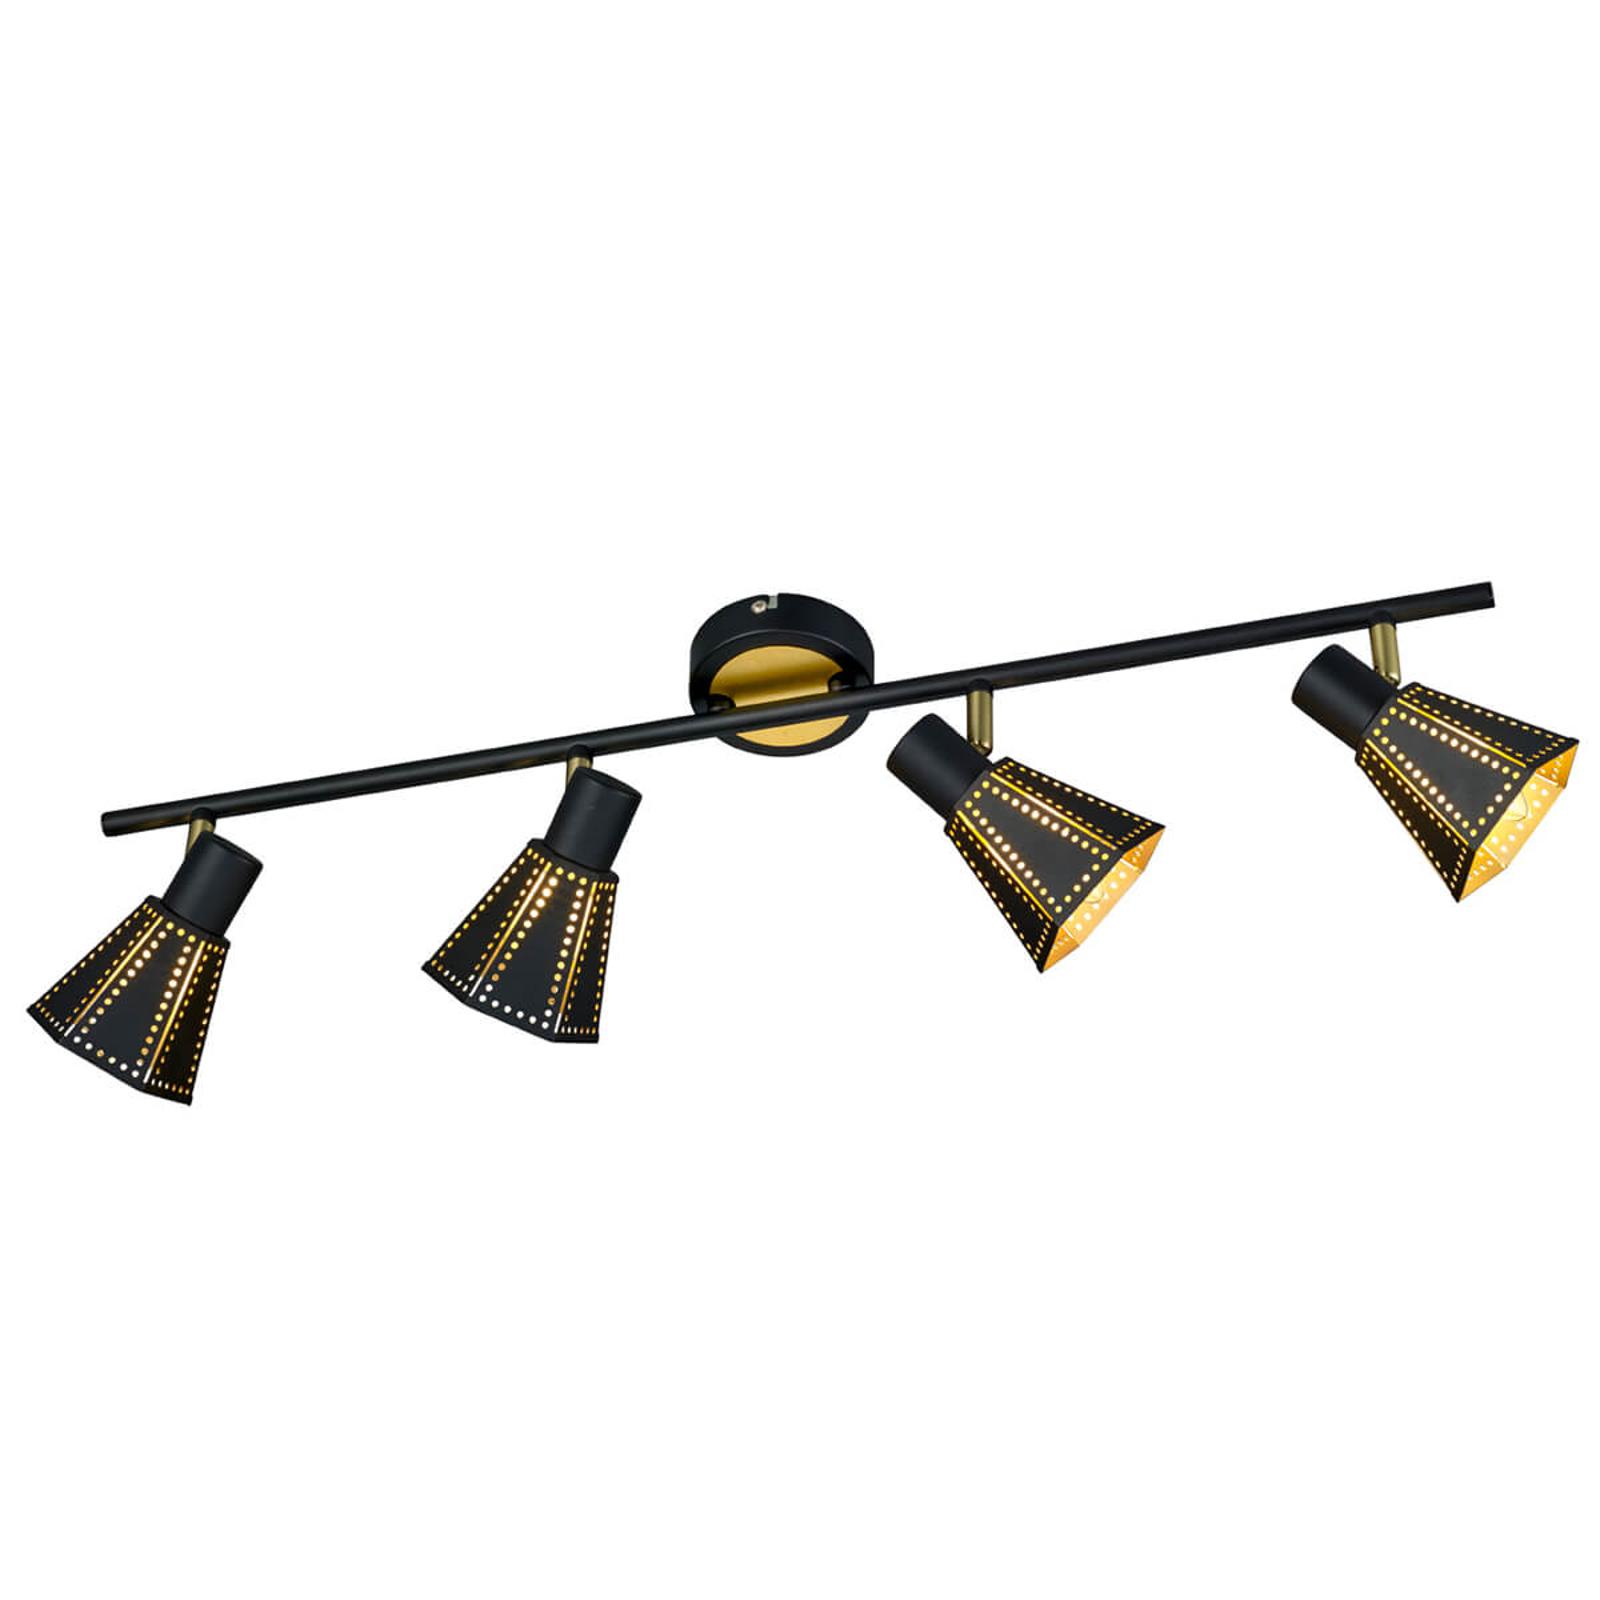 Trendige Deckenlampe Houston, 4-flammig